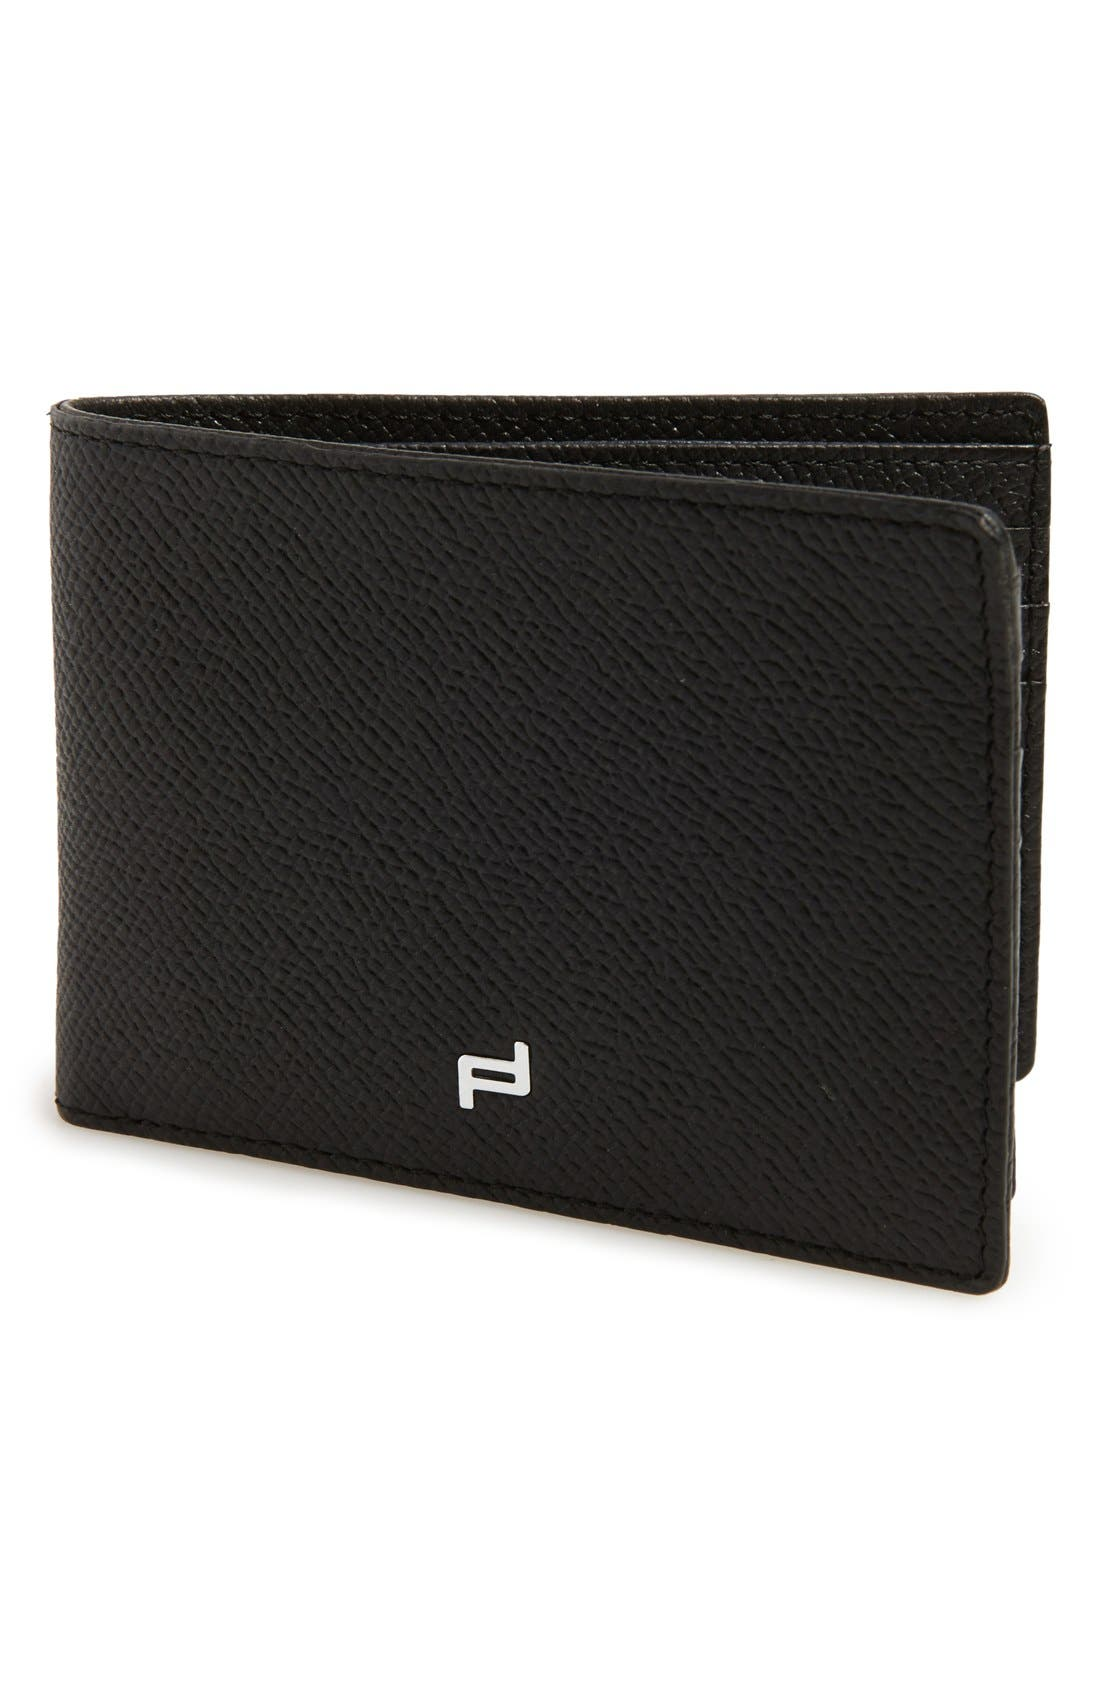 'FC 3.0' Leather L-Fold Wallet,                         Main,                         color, Black